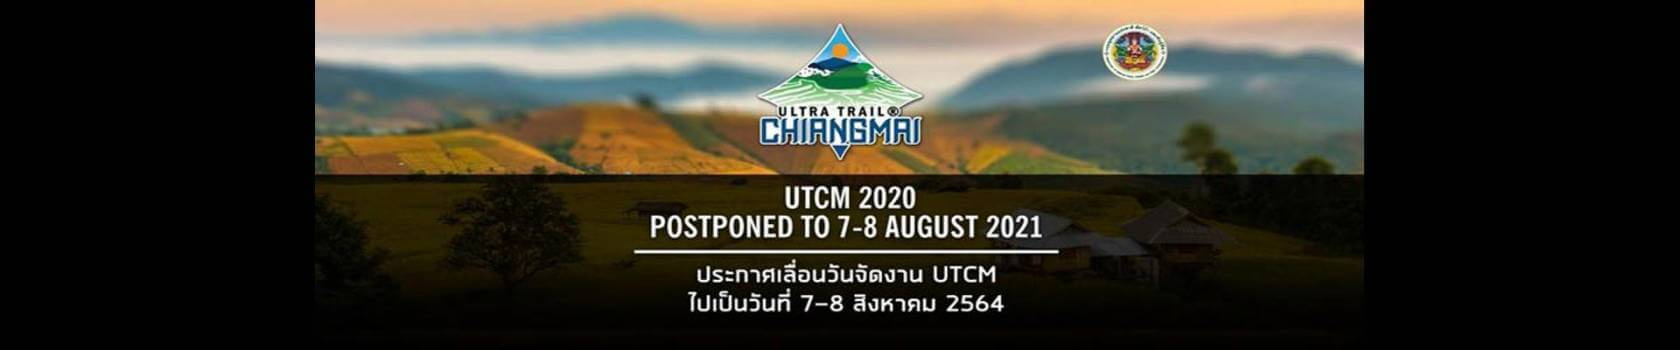 Ultra Trail Chiangmai 2021